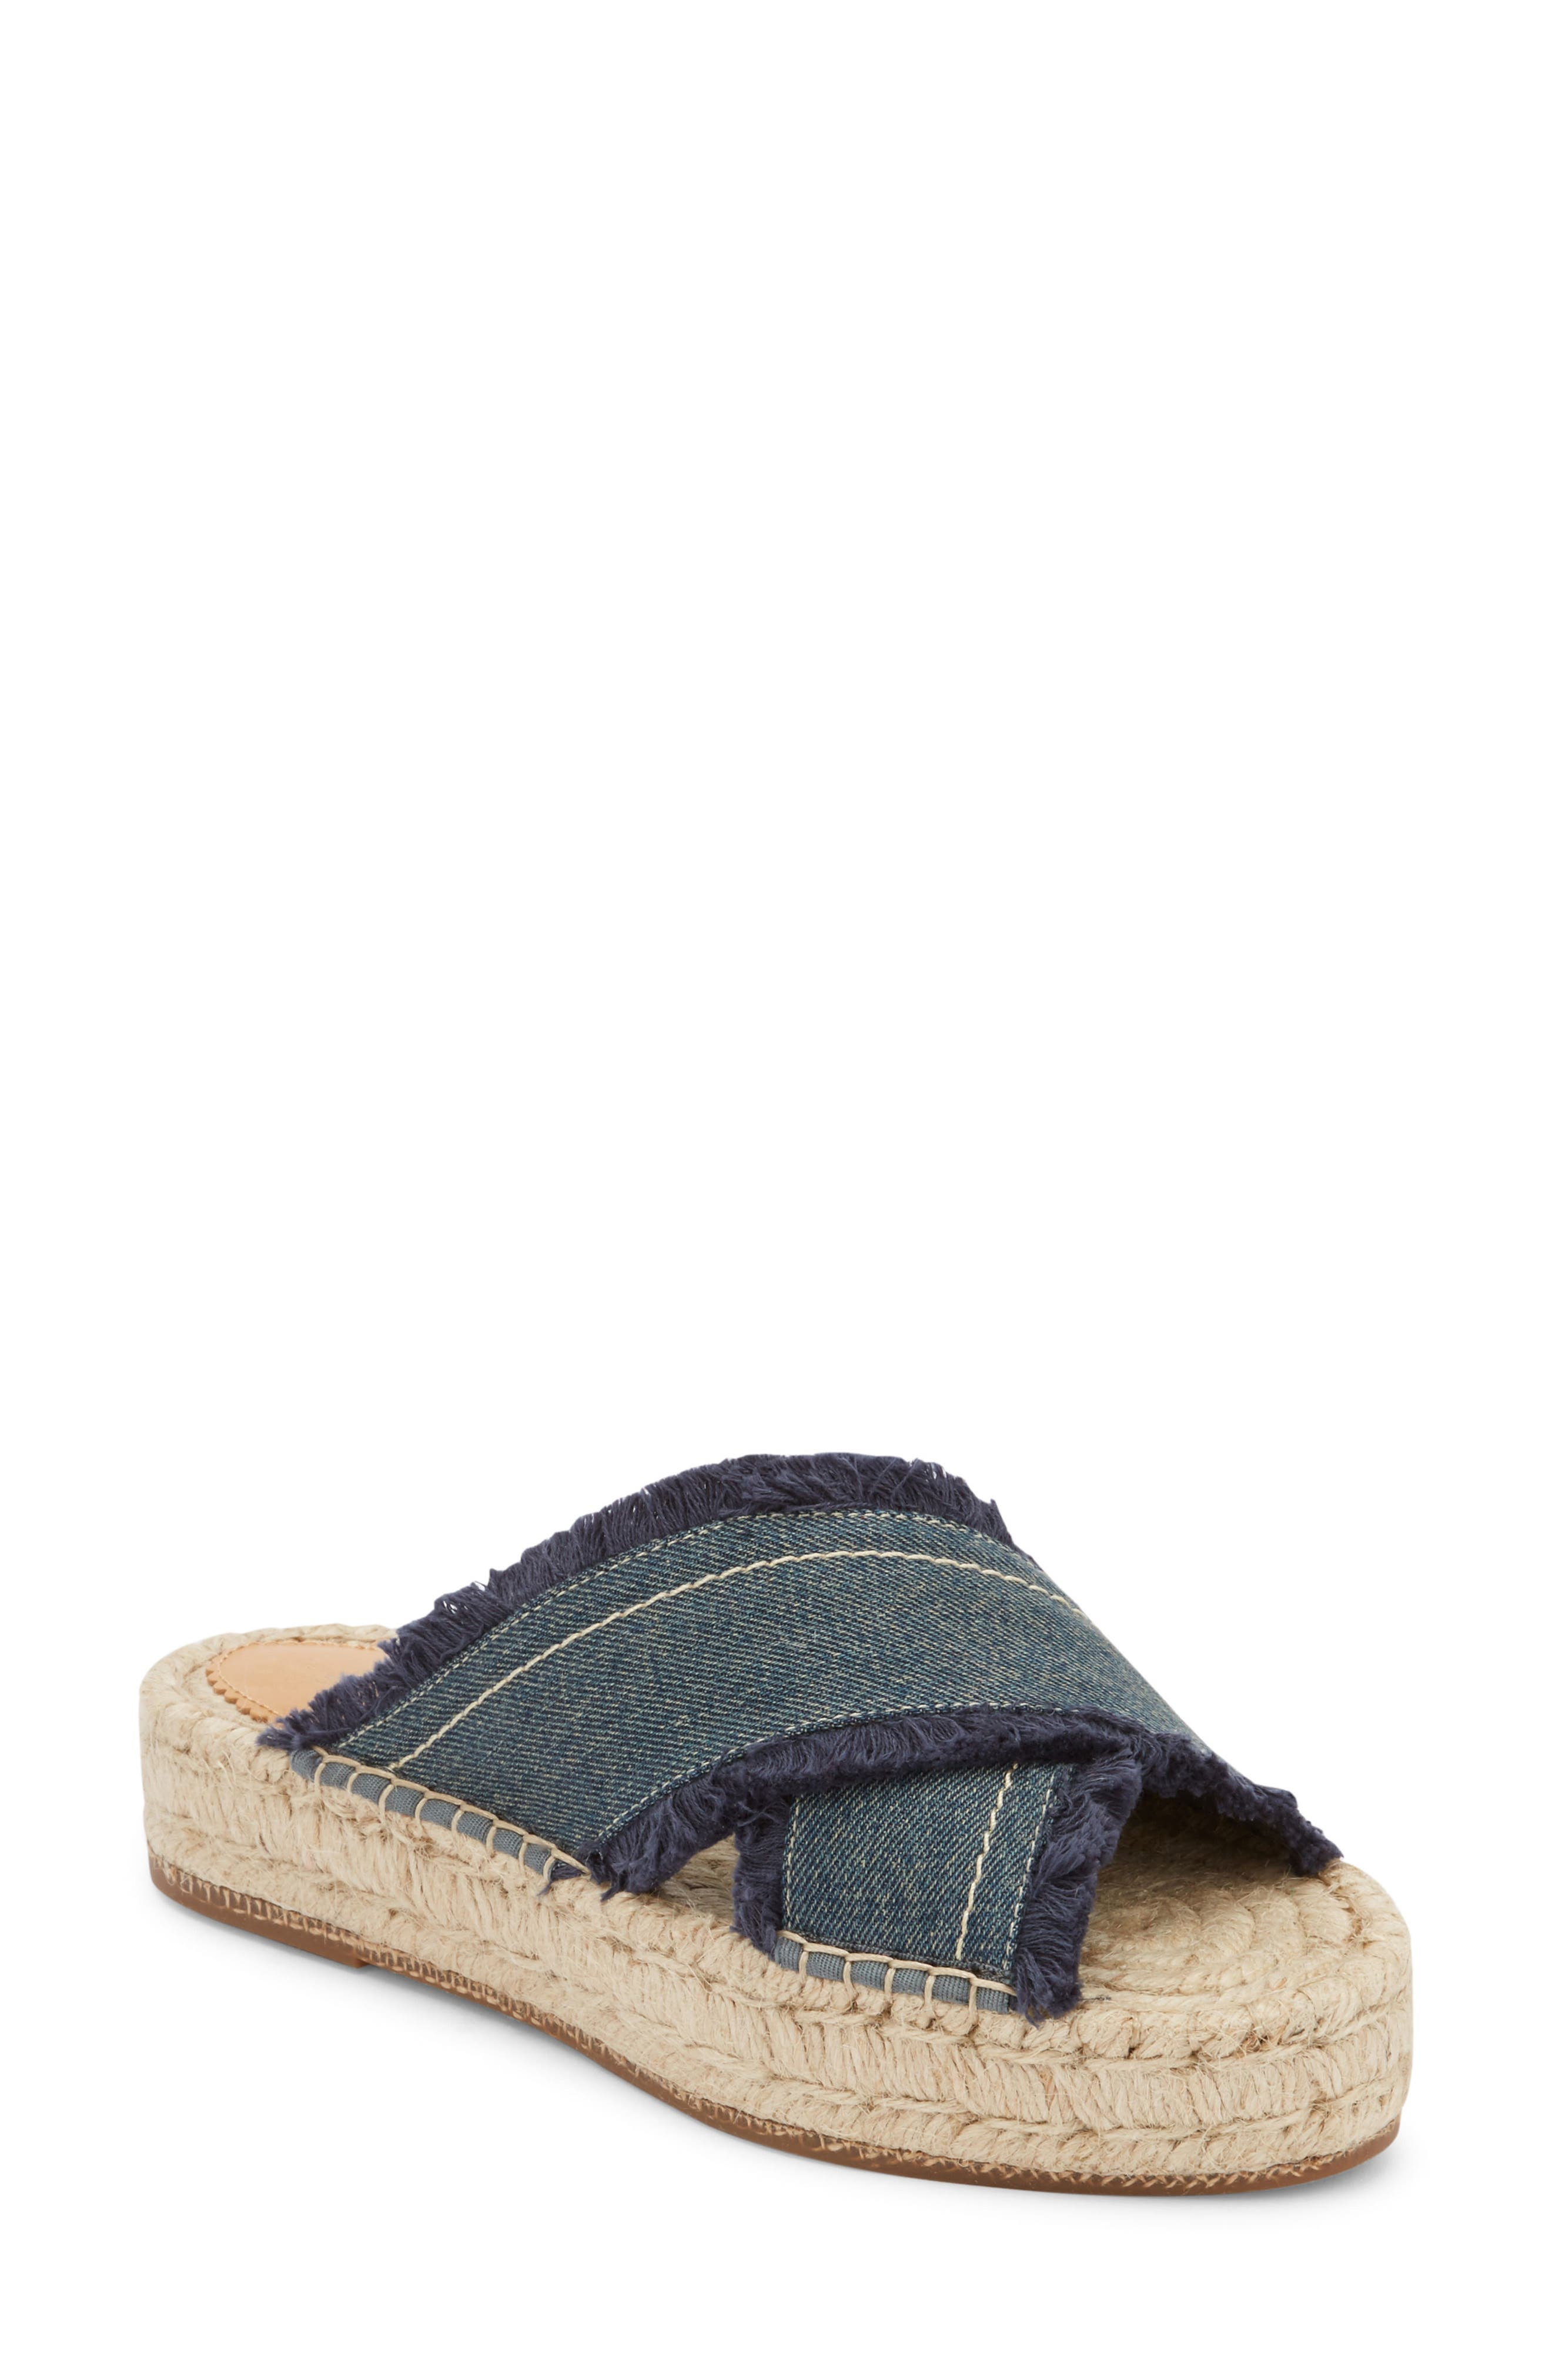 G.H. BASS & CO. Anabelle Espadrille Sandal in Dark Blue Denim Fabric